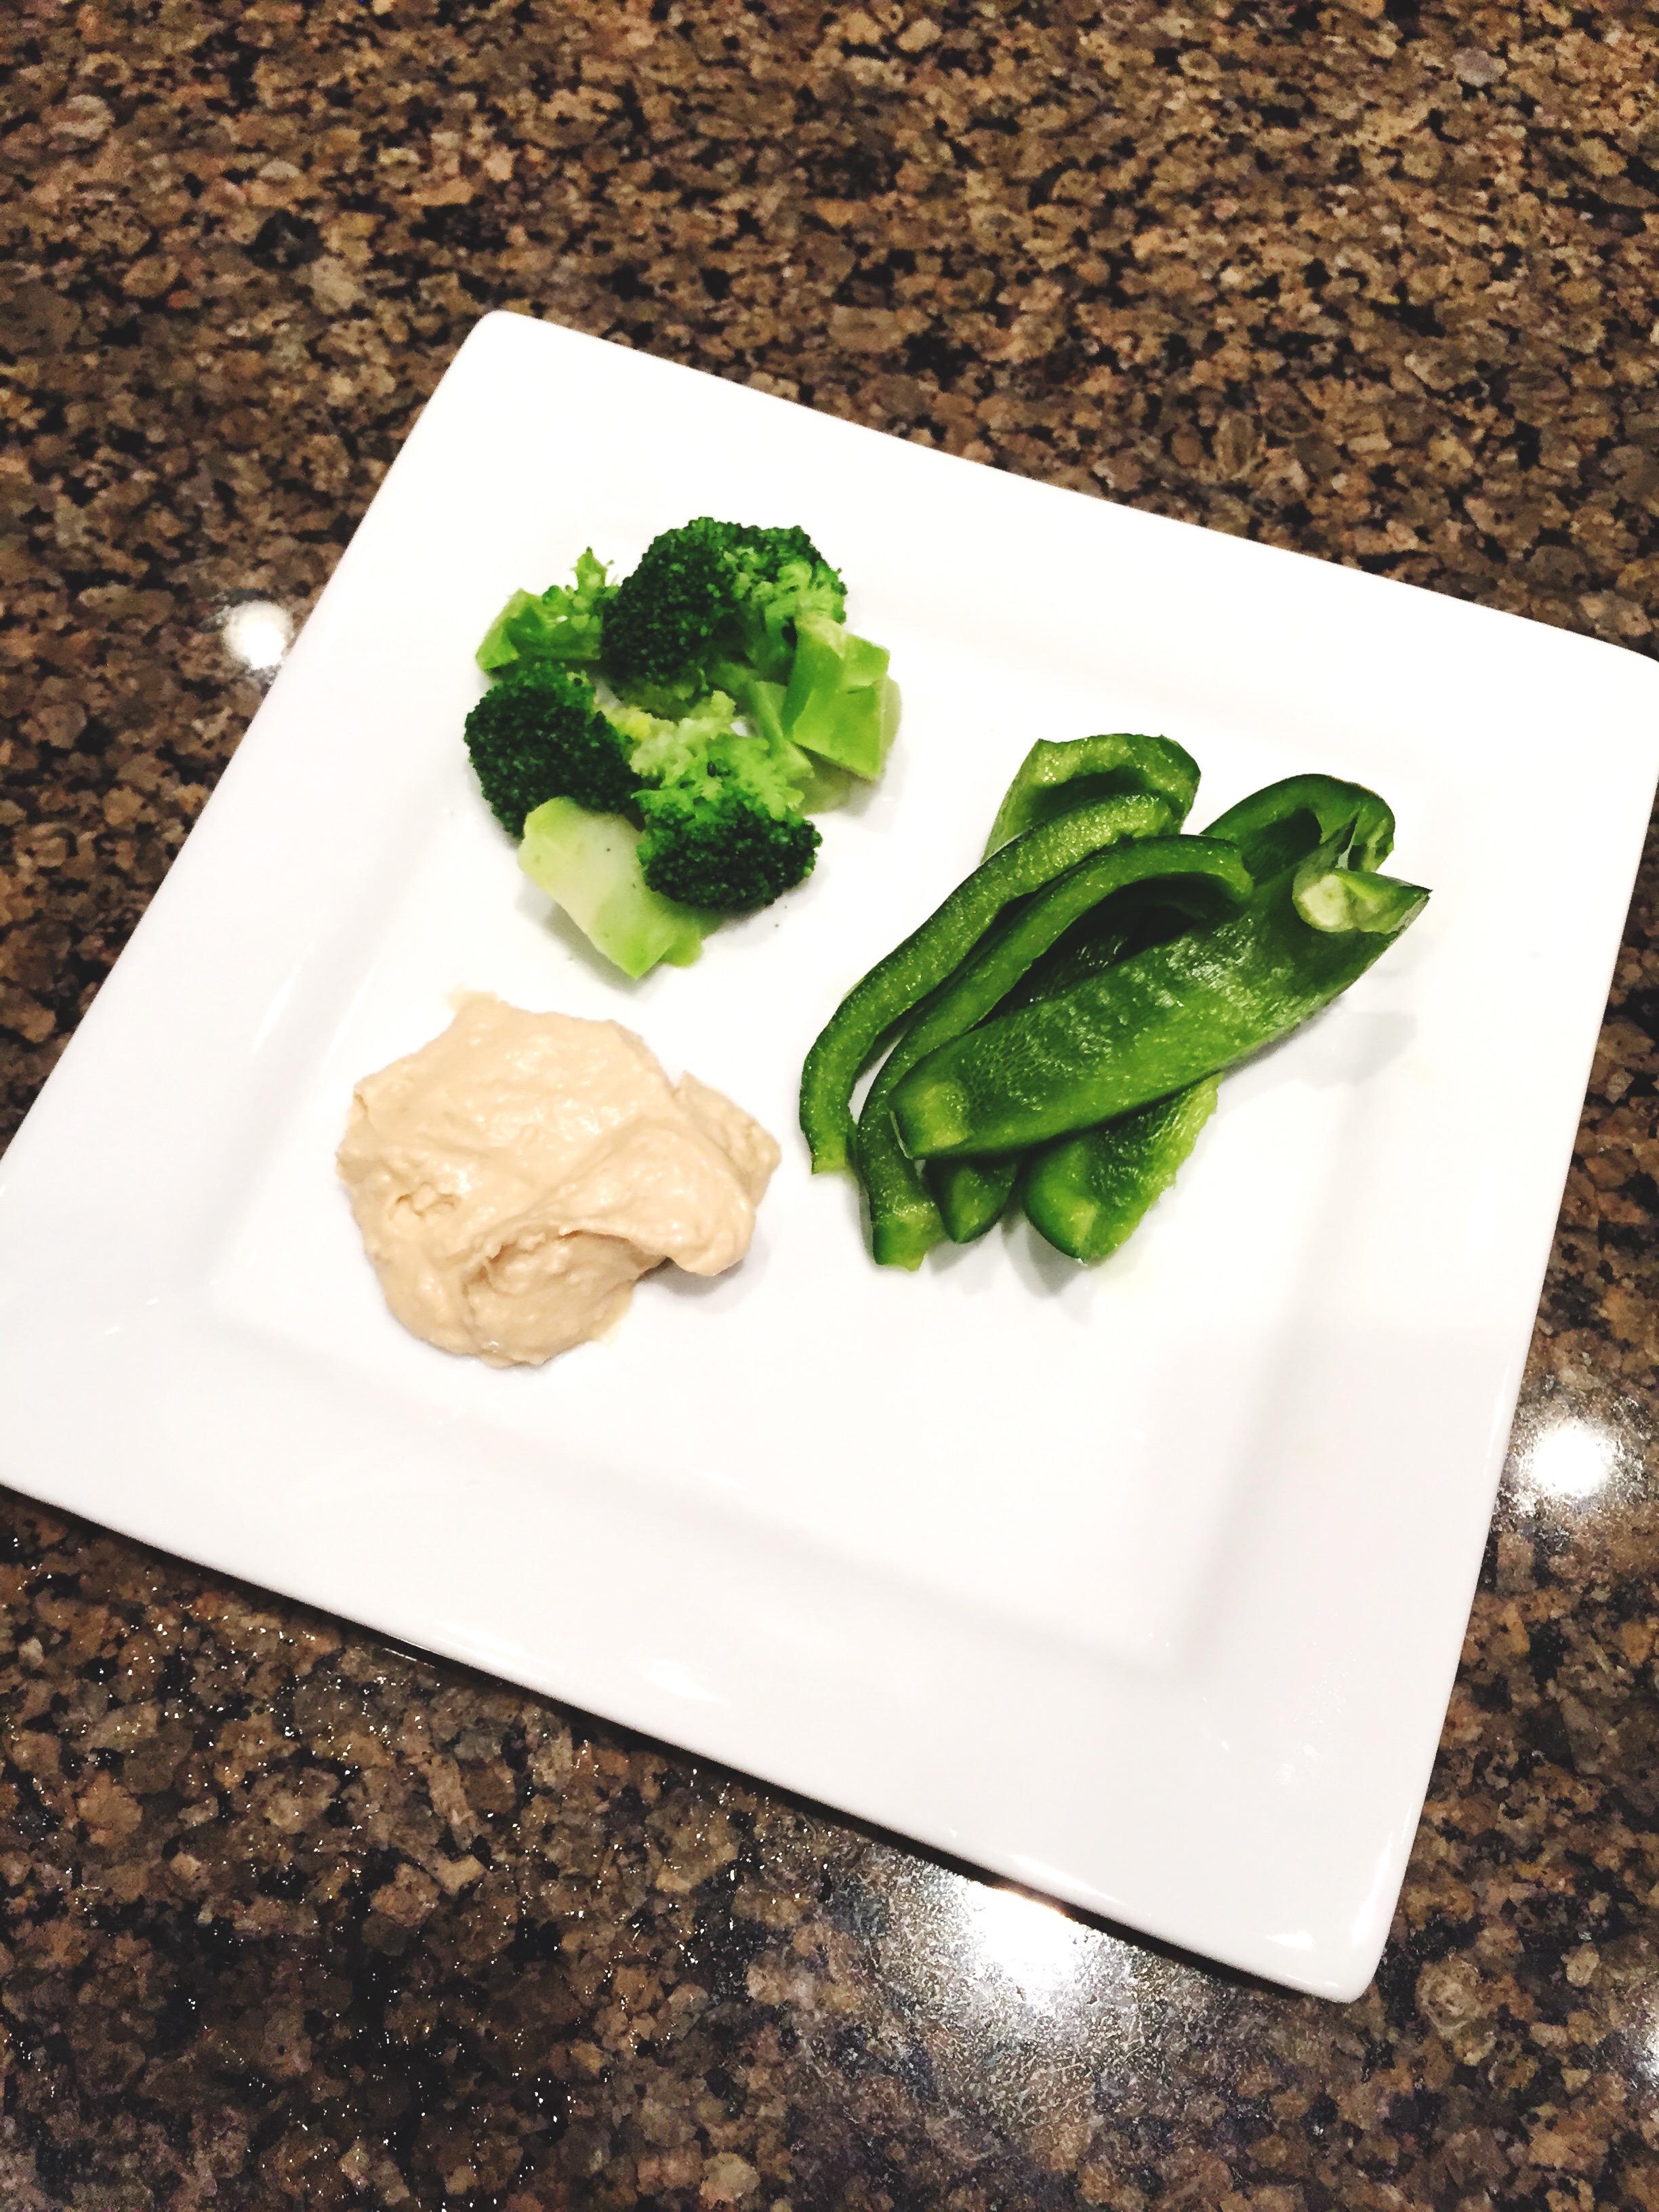 Broccoli and Hummus | Back To School Snacks | YES! Nutrition, LLC